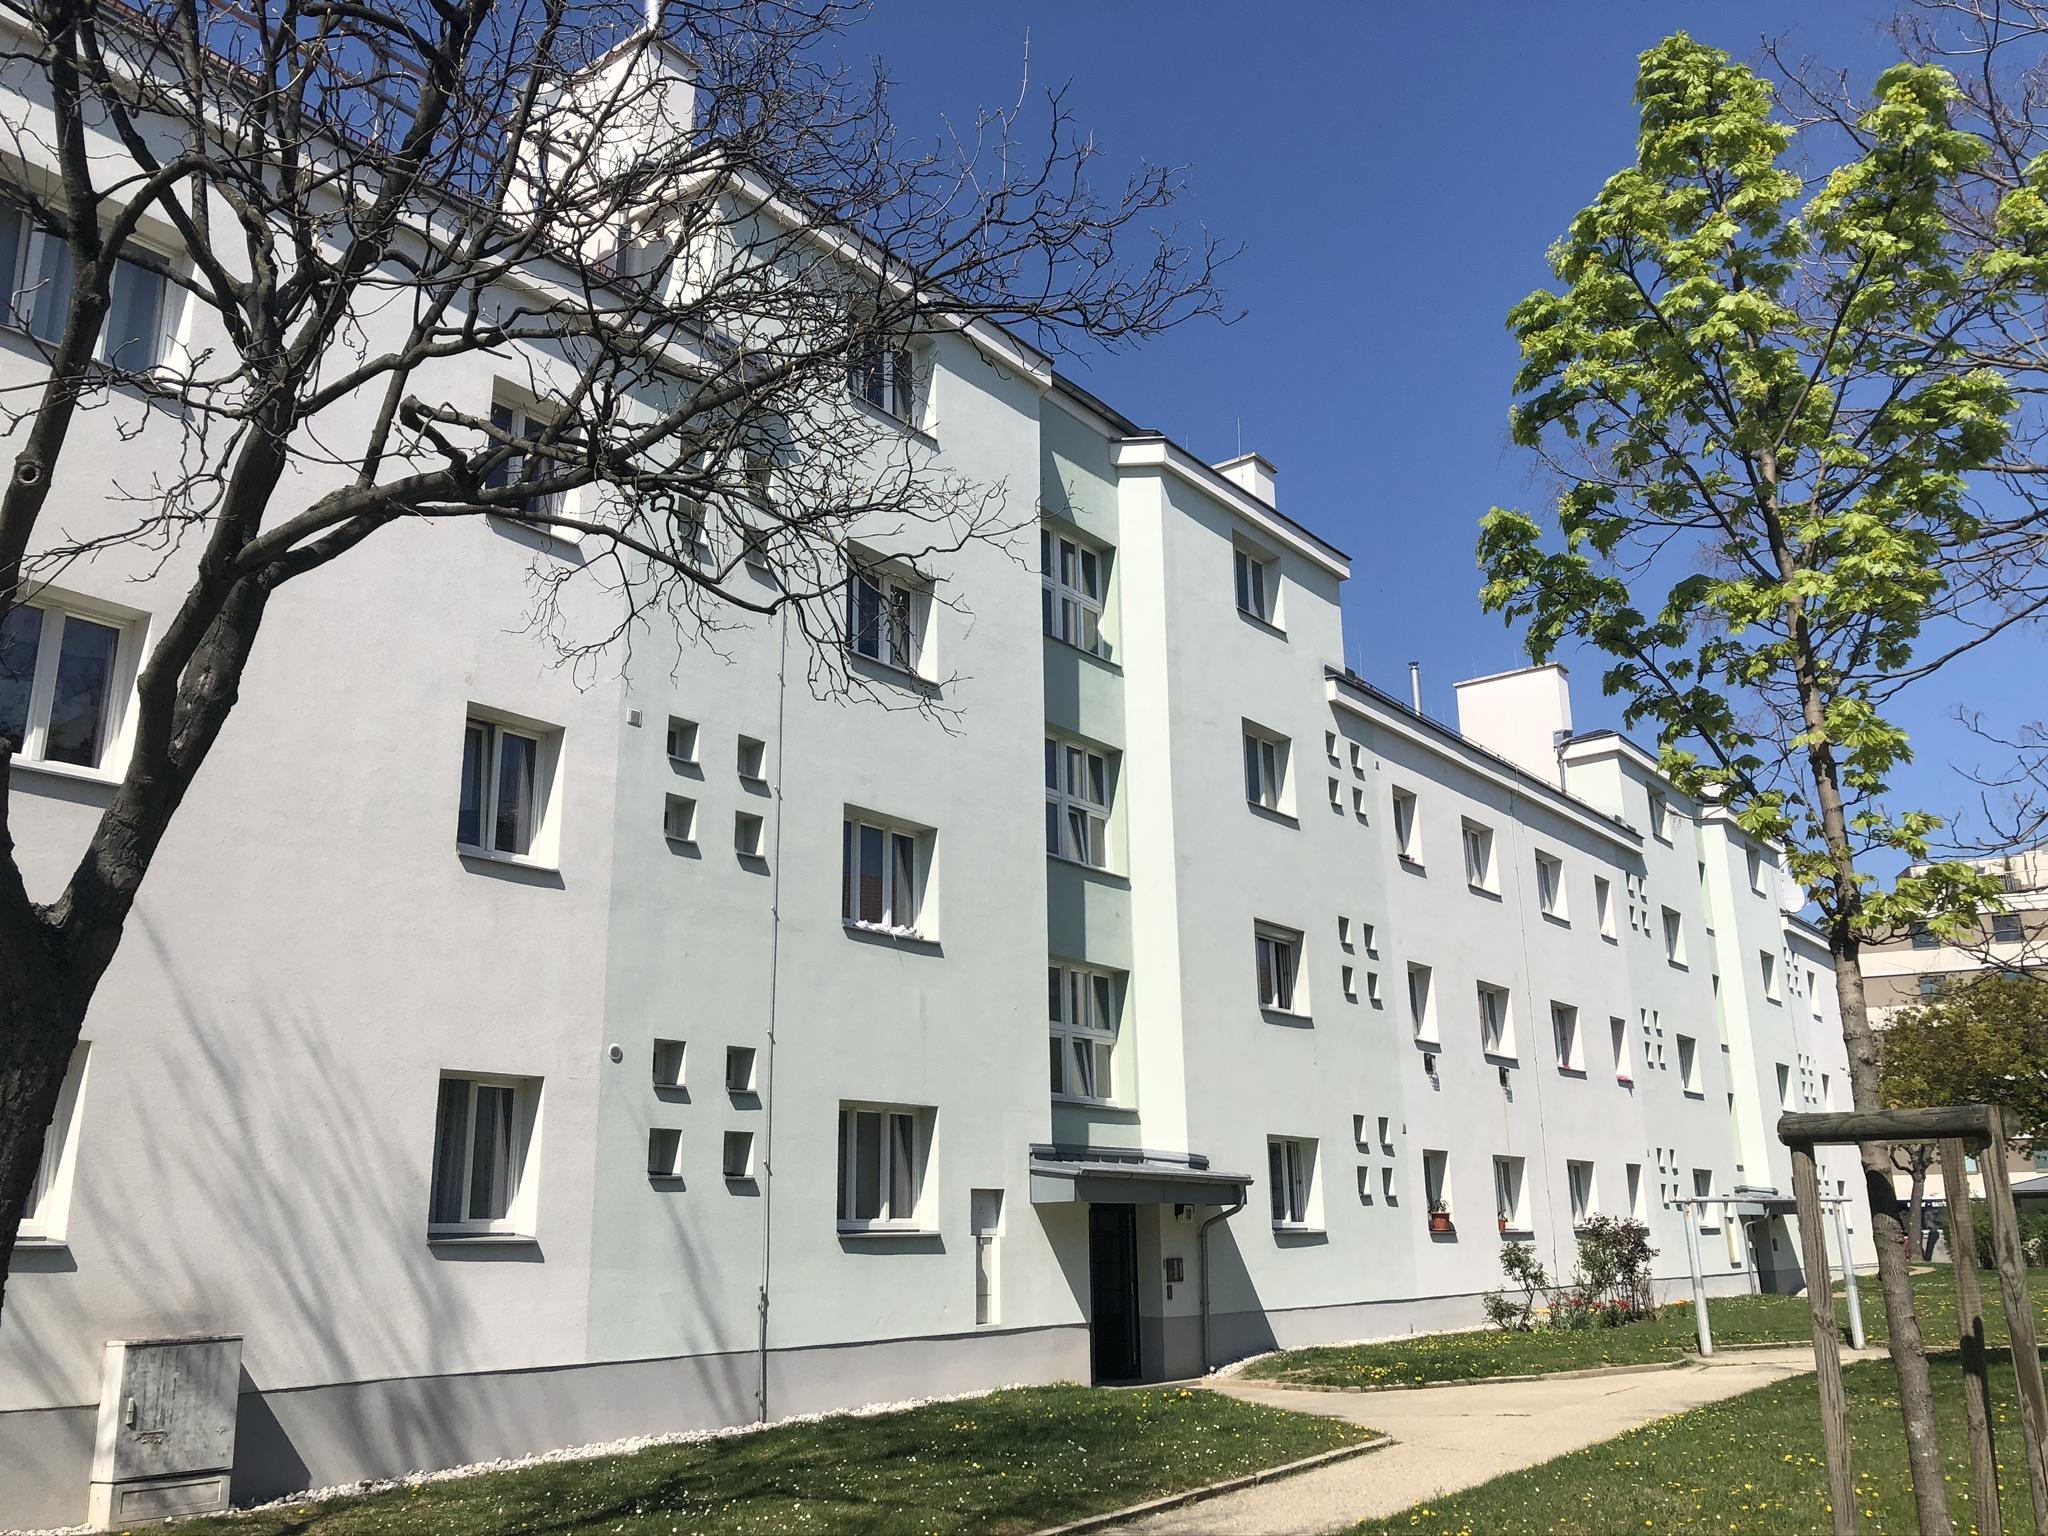 Raxstrasse00001